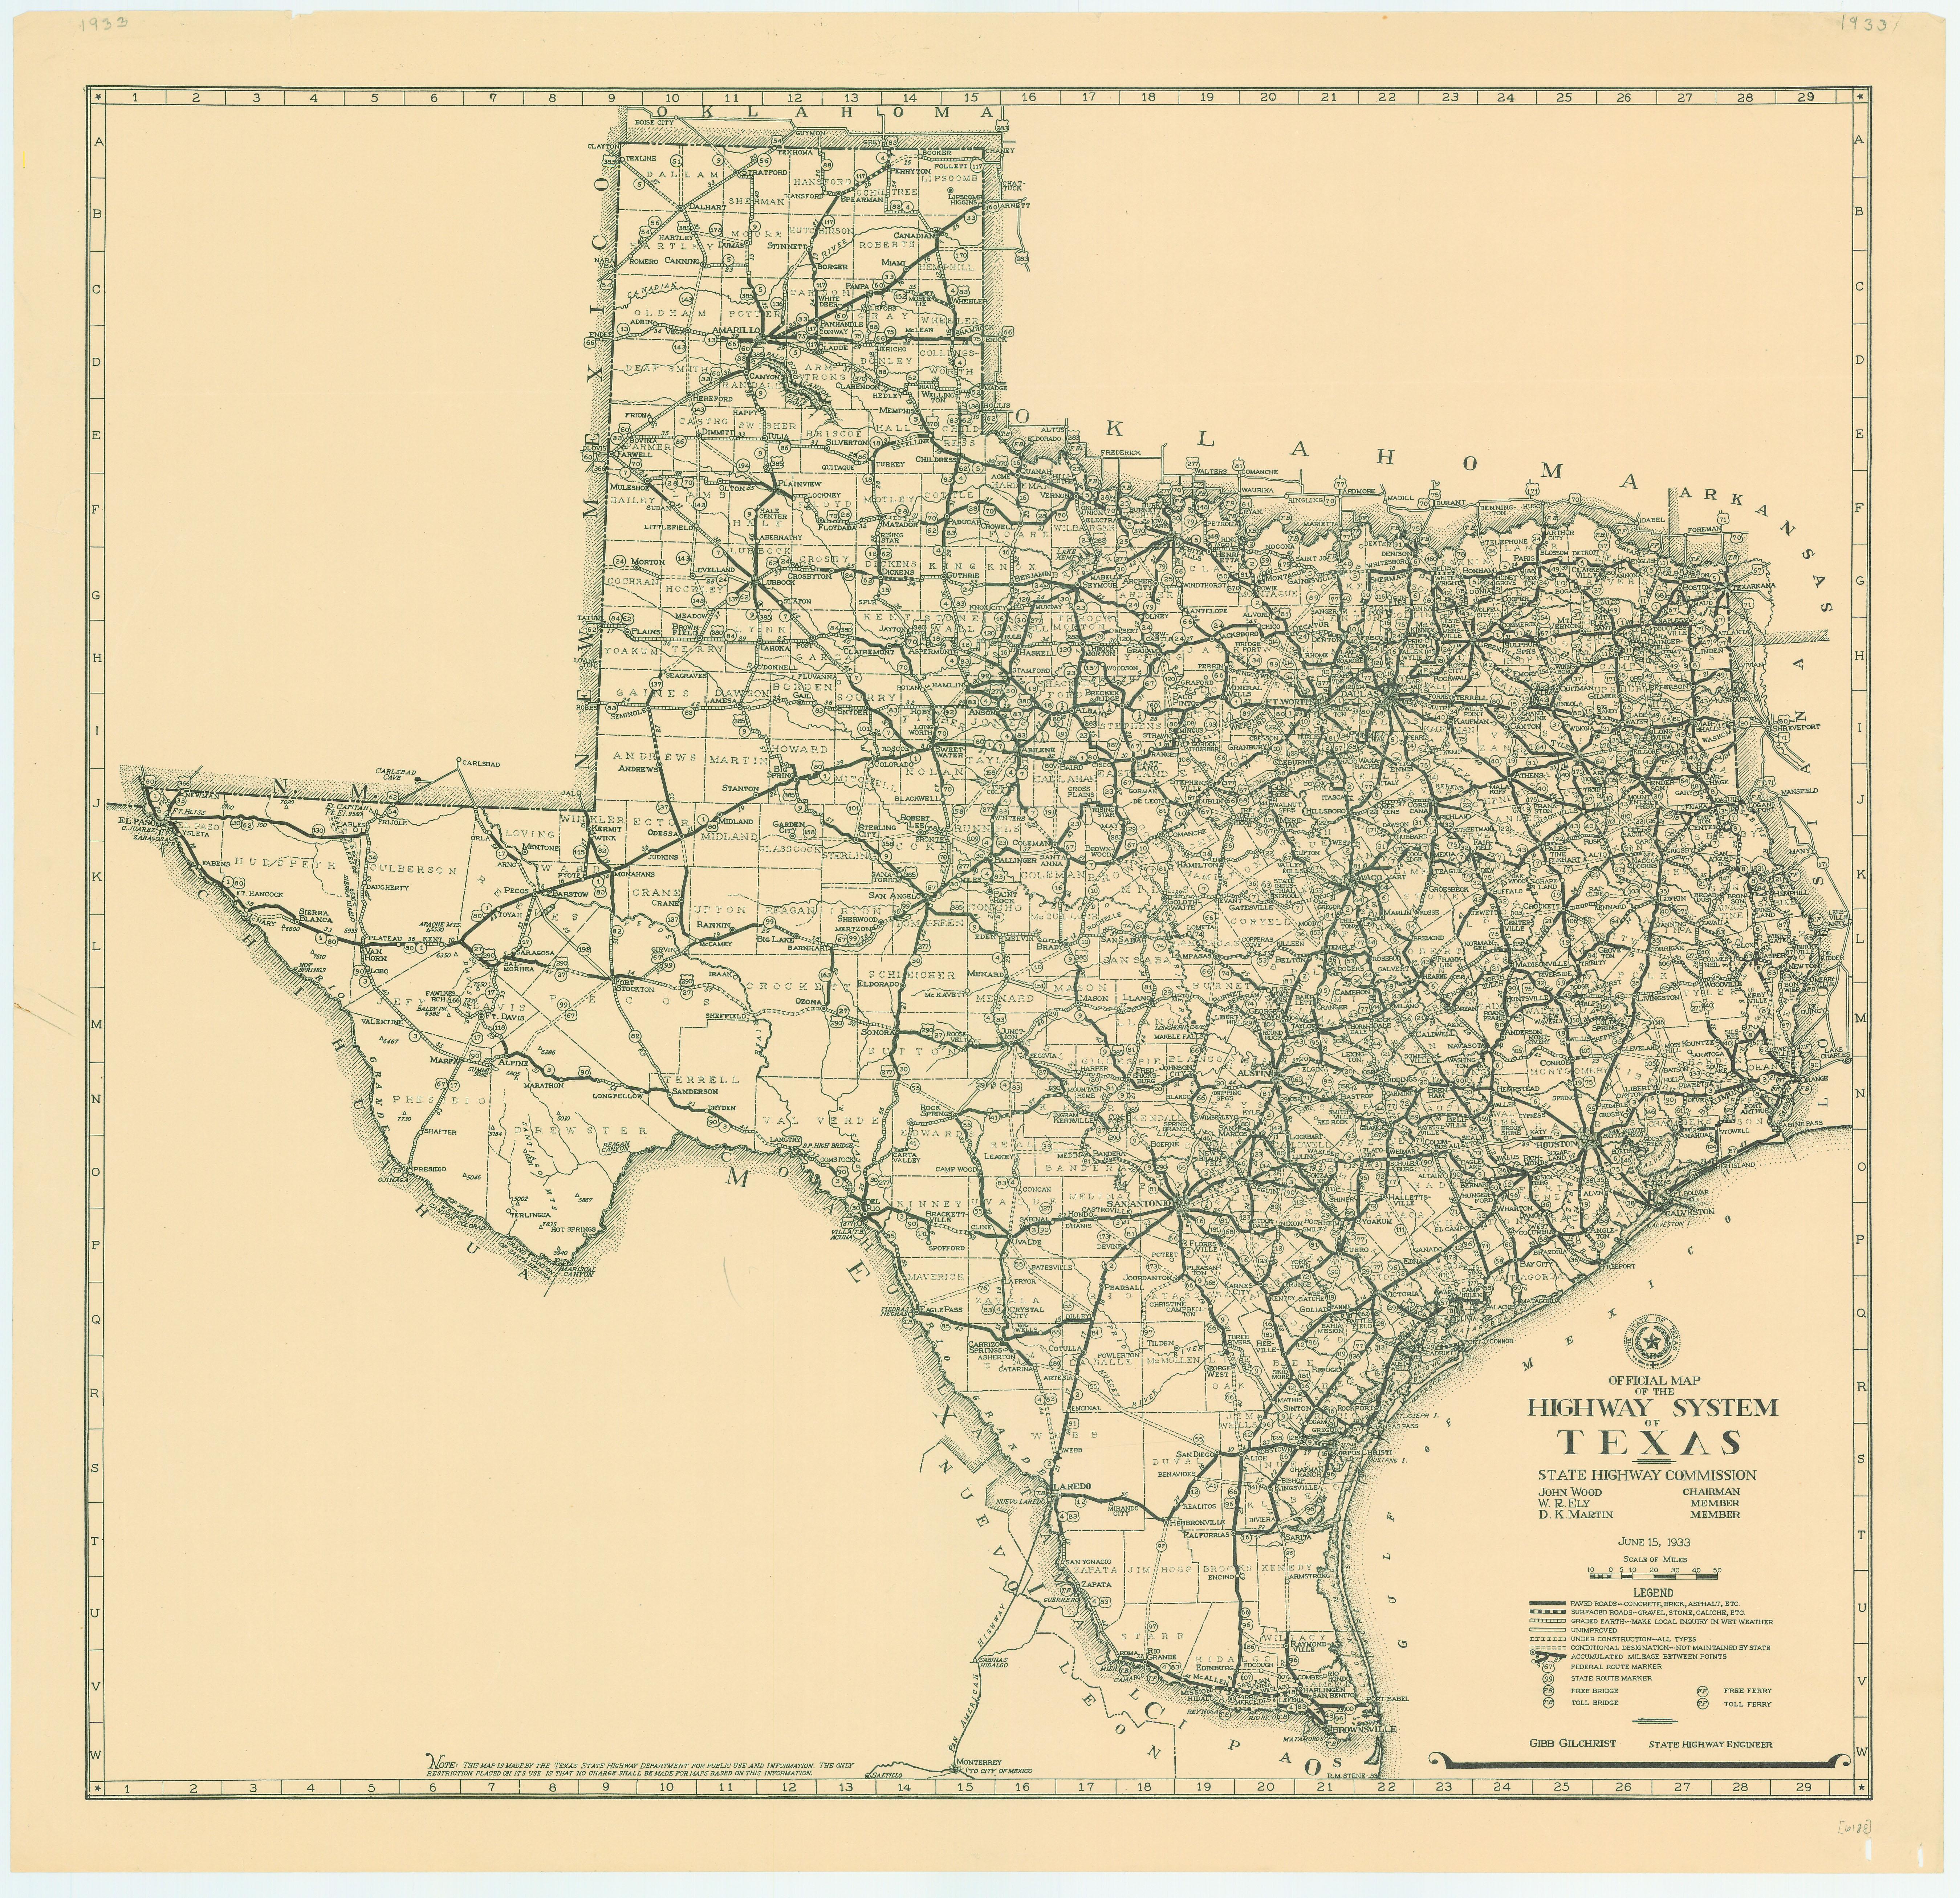 Wikipedia TalkWikiProject US RoadsTexasArchive Wikipedia - Us road map 1930